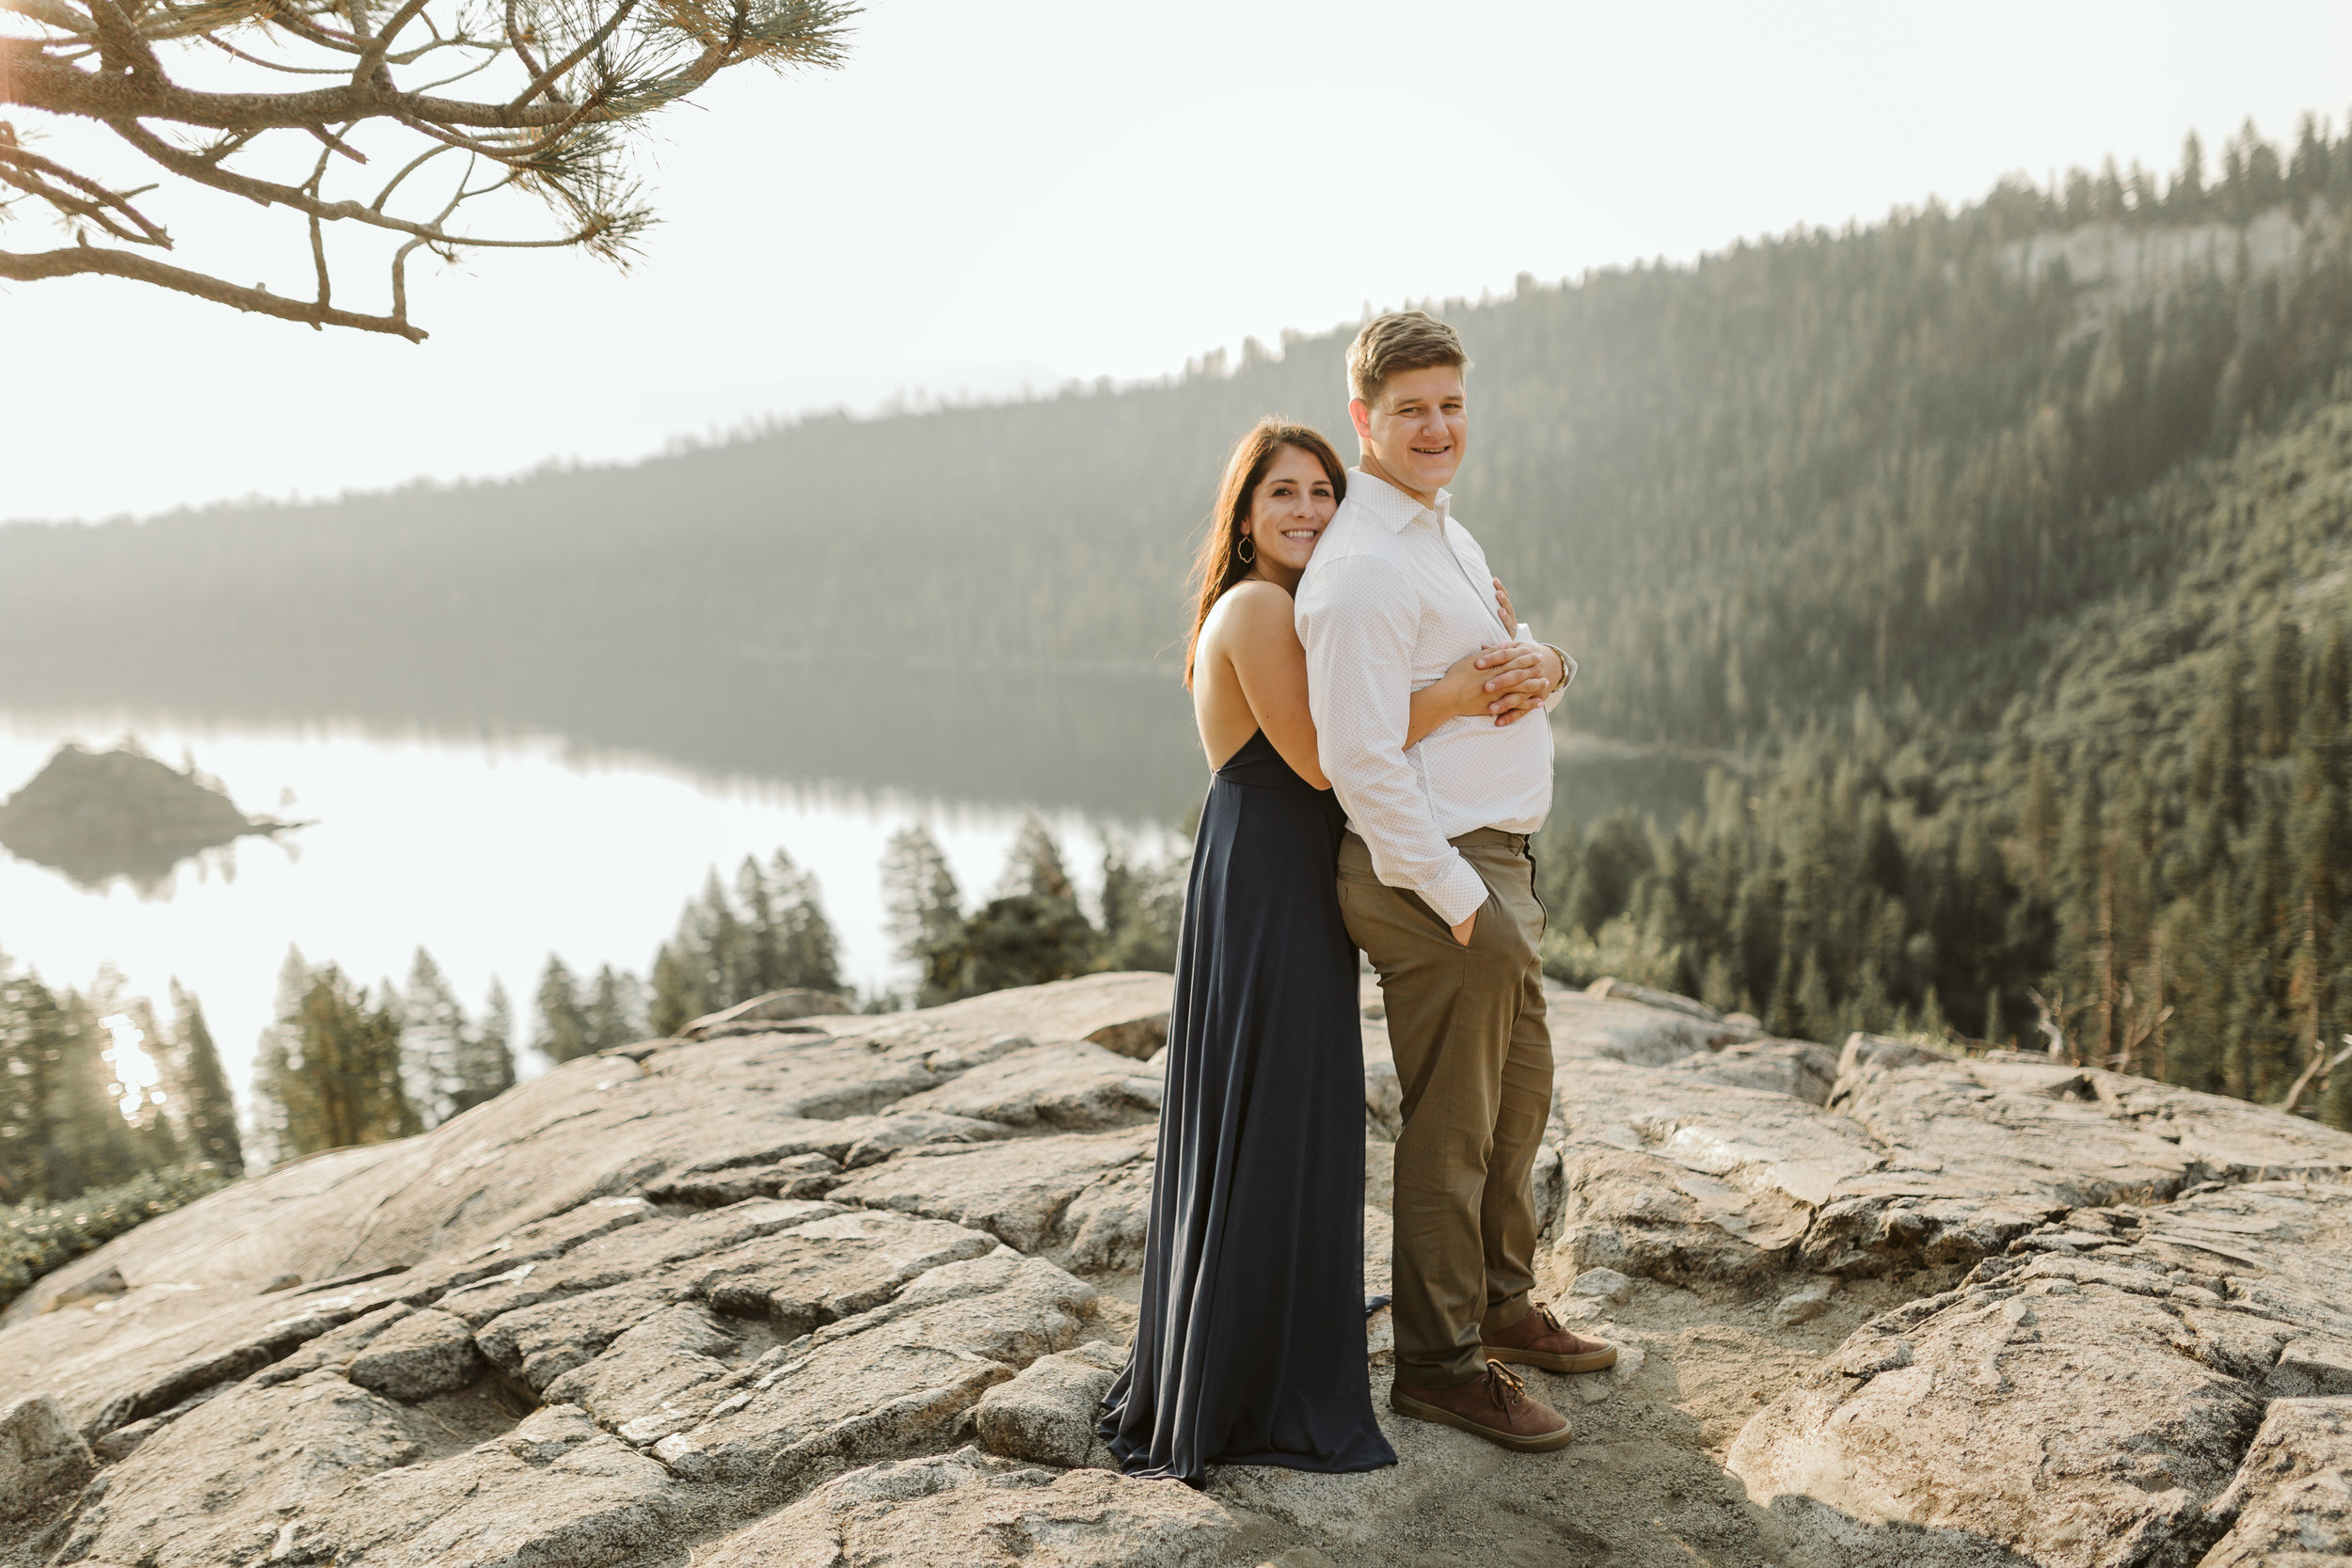 nicole-daacke-photography-lake-tahoe-sunrise-summer-adventure-engagement-photos-nevada-wedding-elopement-photographer-golden-emerald-bay-light-pine-trees-summer-vibe-fun-carefree-authentic-love-45.jpg